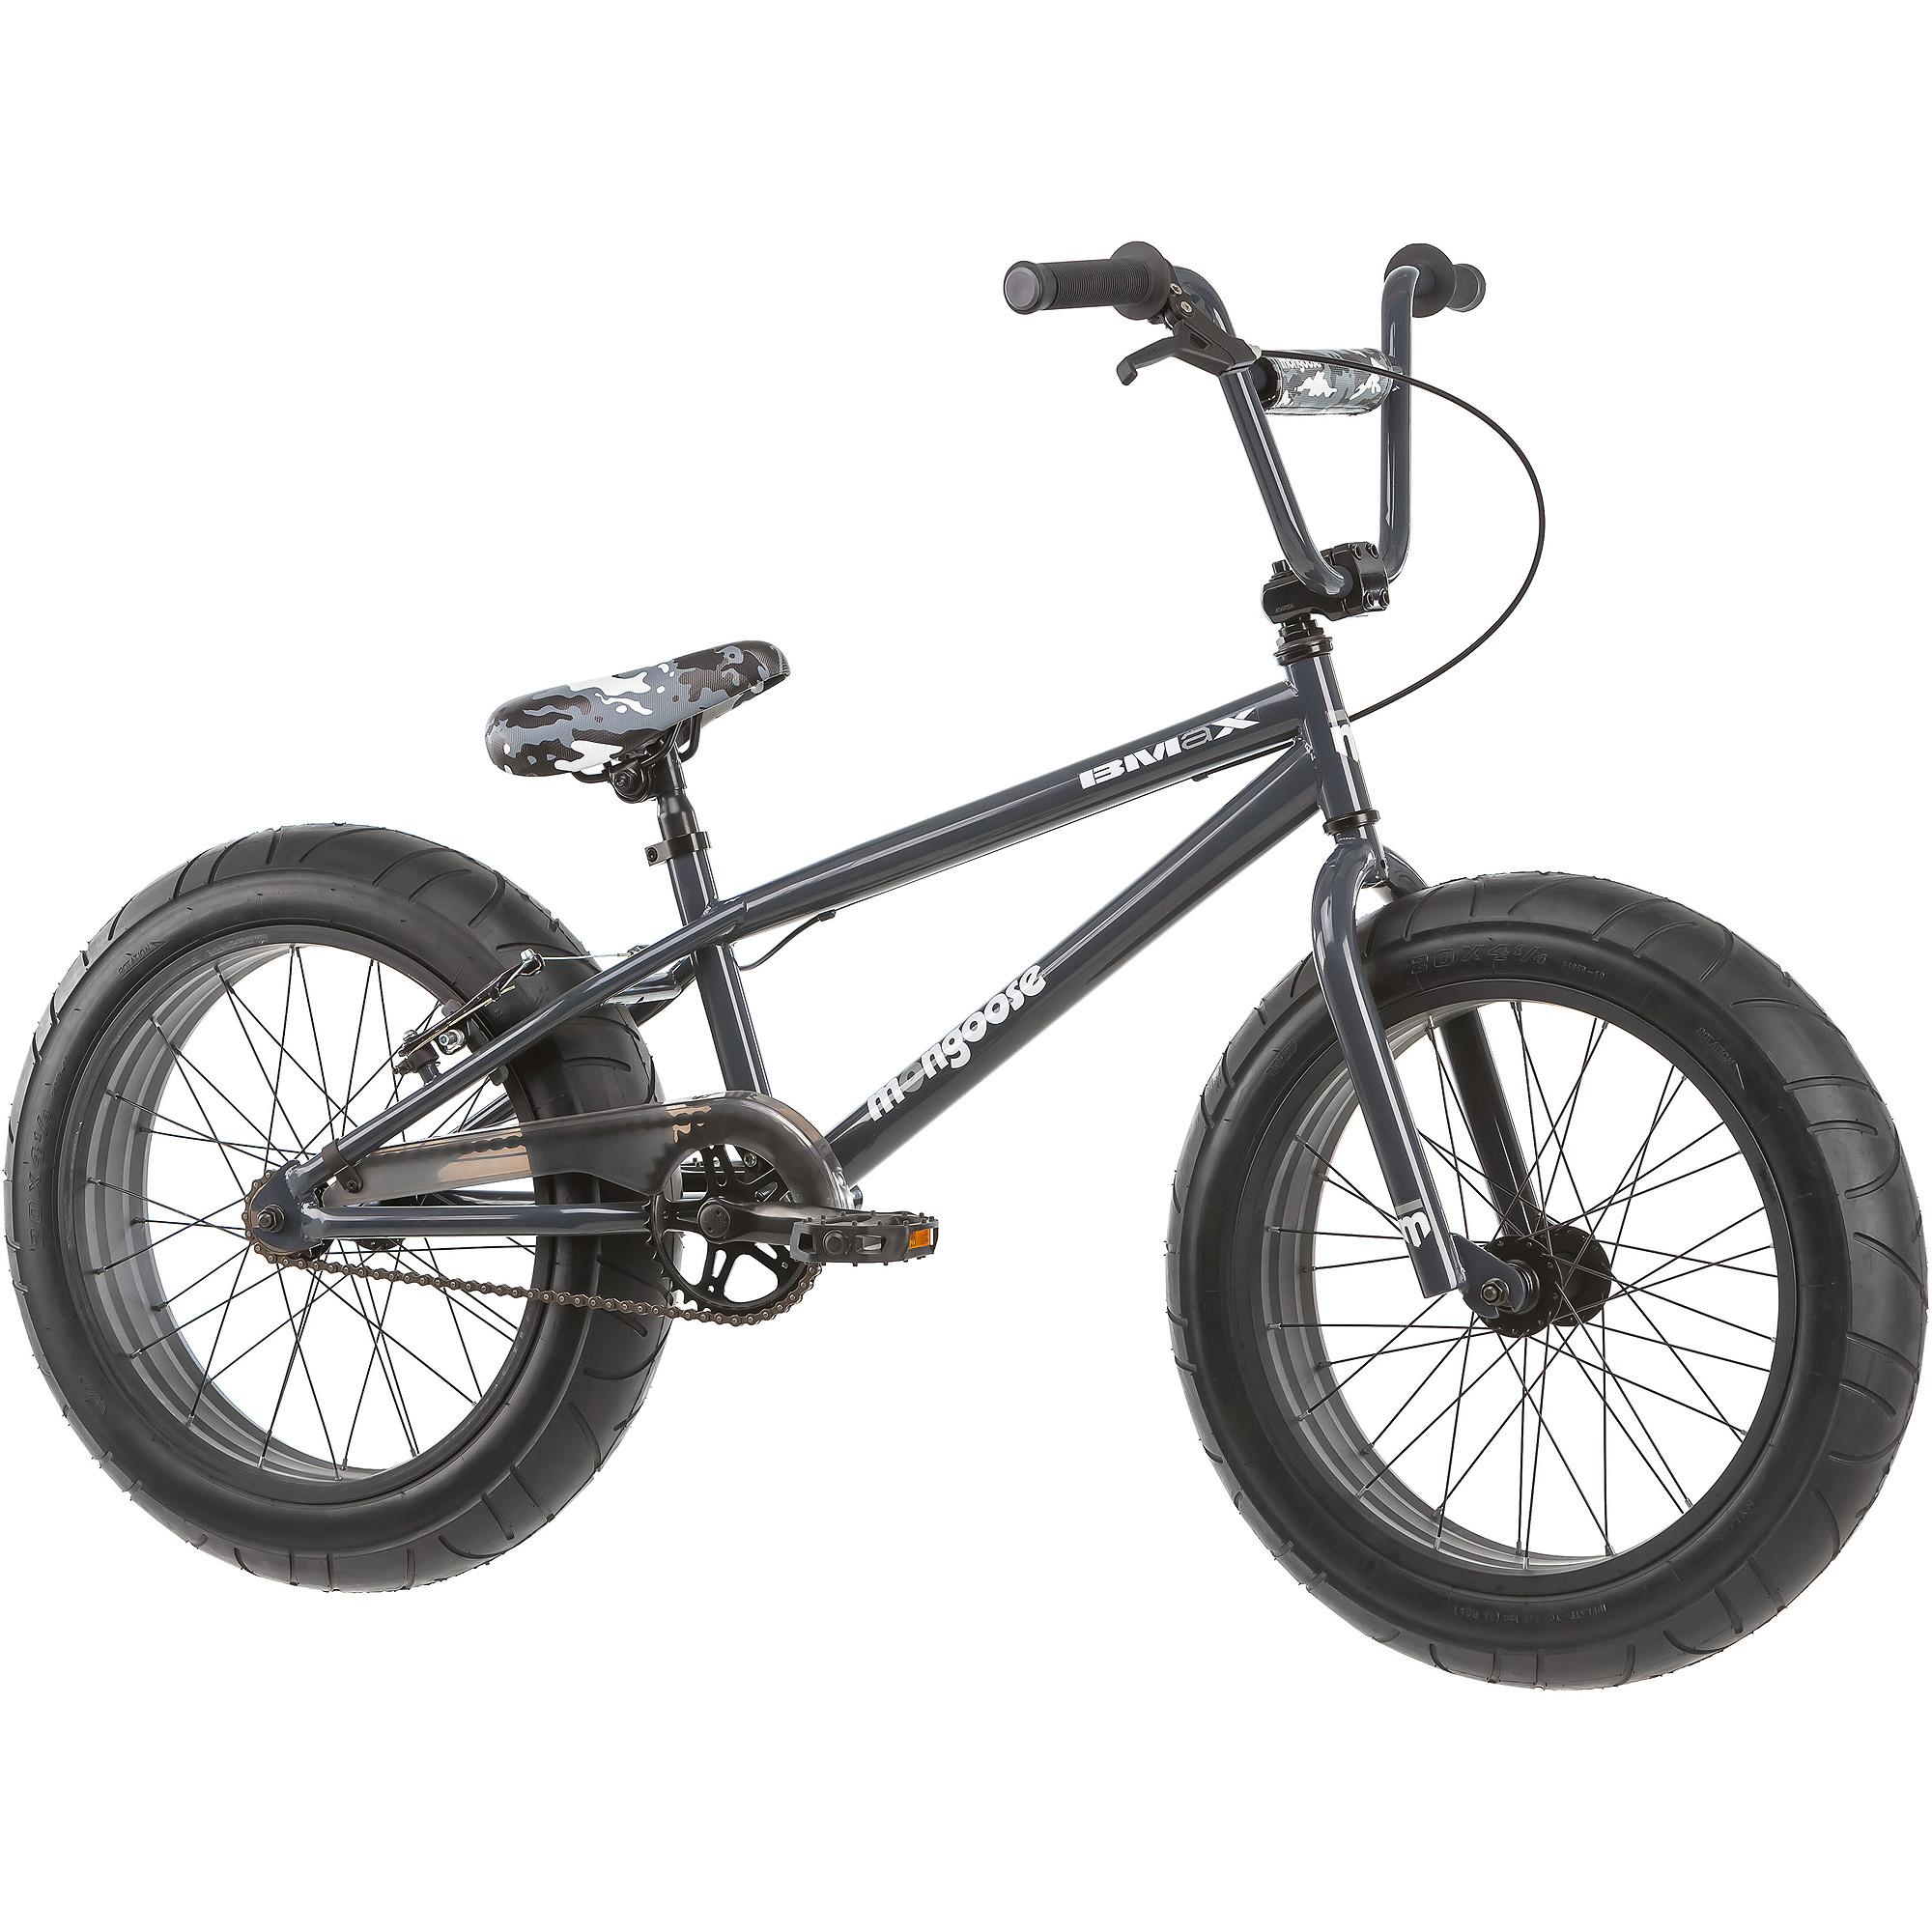 Pacific Cycle 20 Mongoose BMaX All - Terrain Fat Tire Mountain Bike, Black / Gray